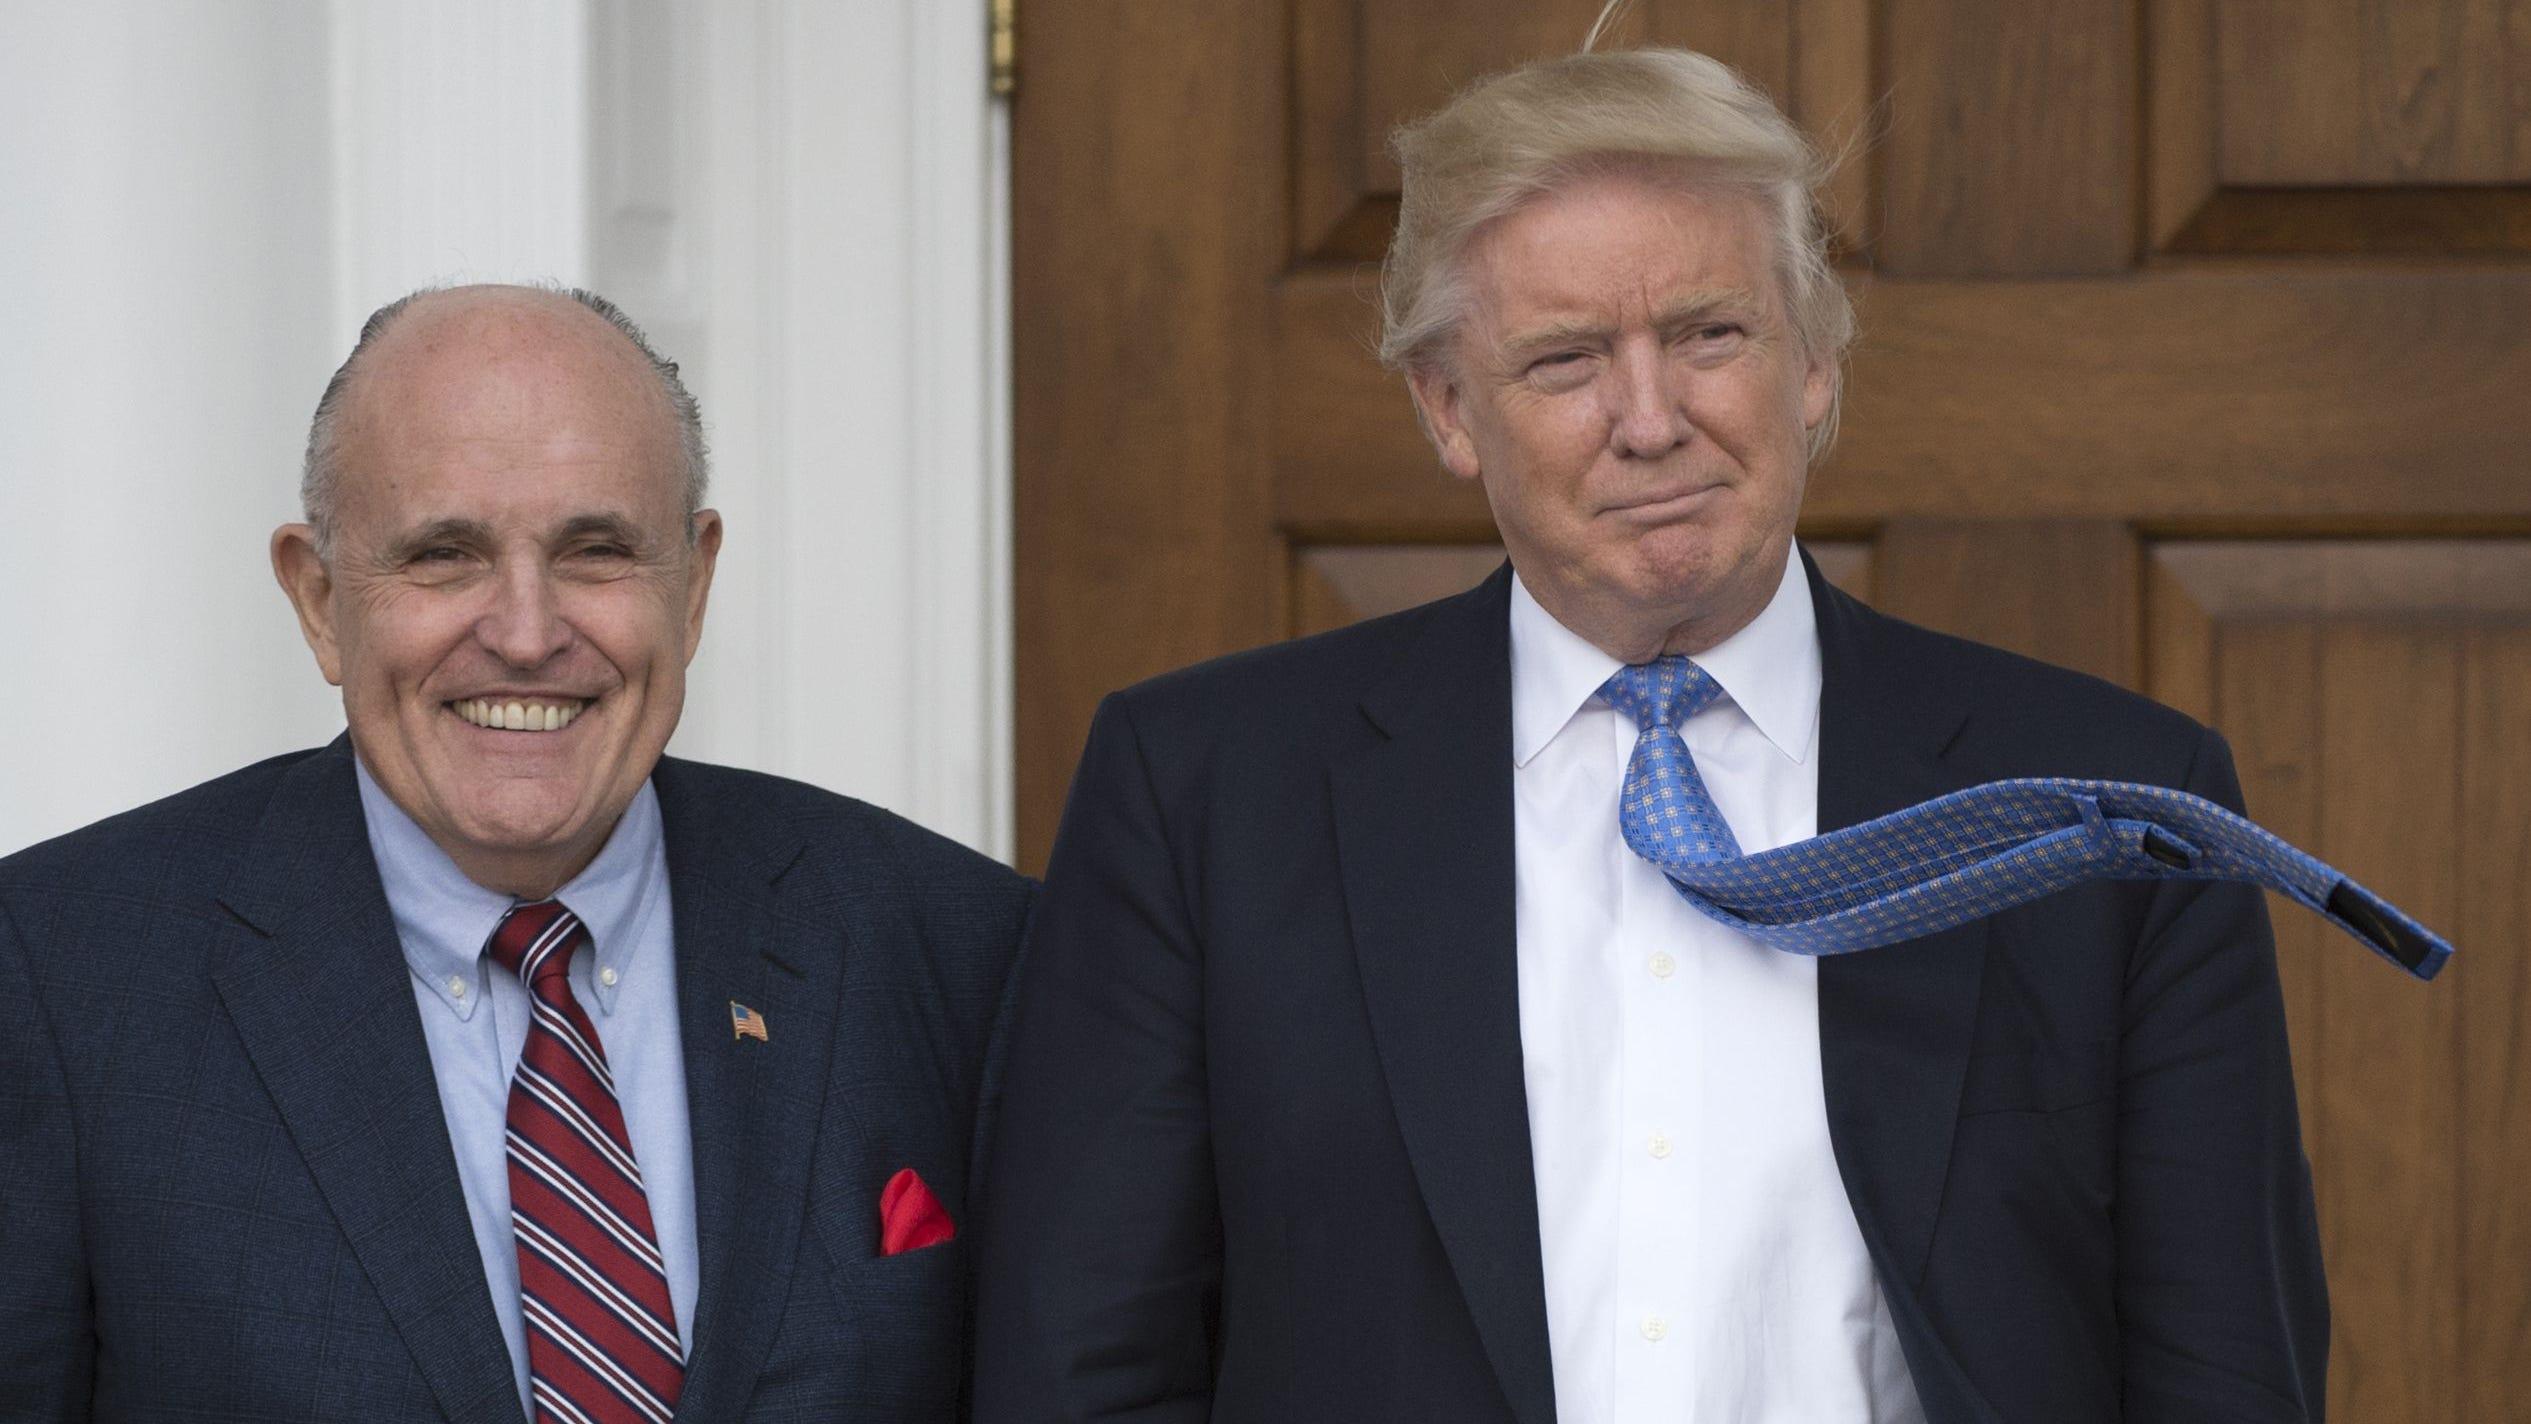 Donald Trump and Rudy Giuliani, Trump National Golf Club, Nov, 20, 2016, Bedminster, New Jersey.